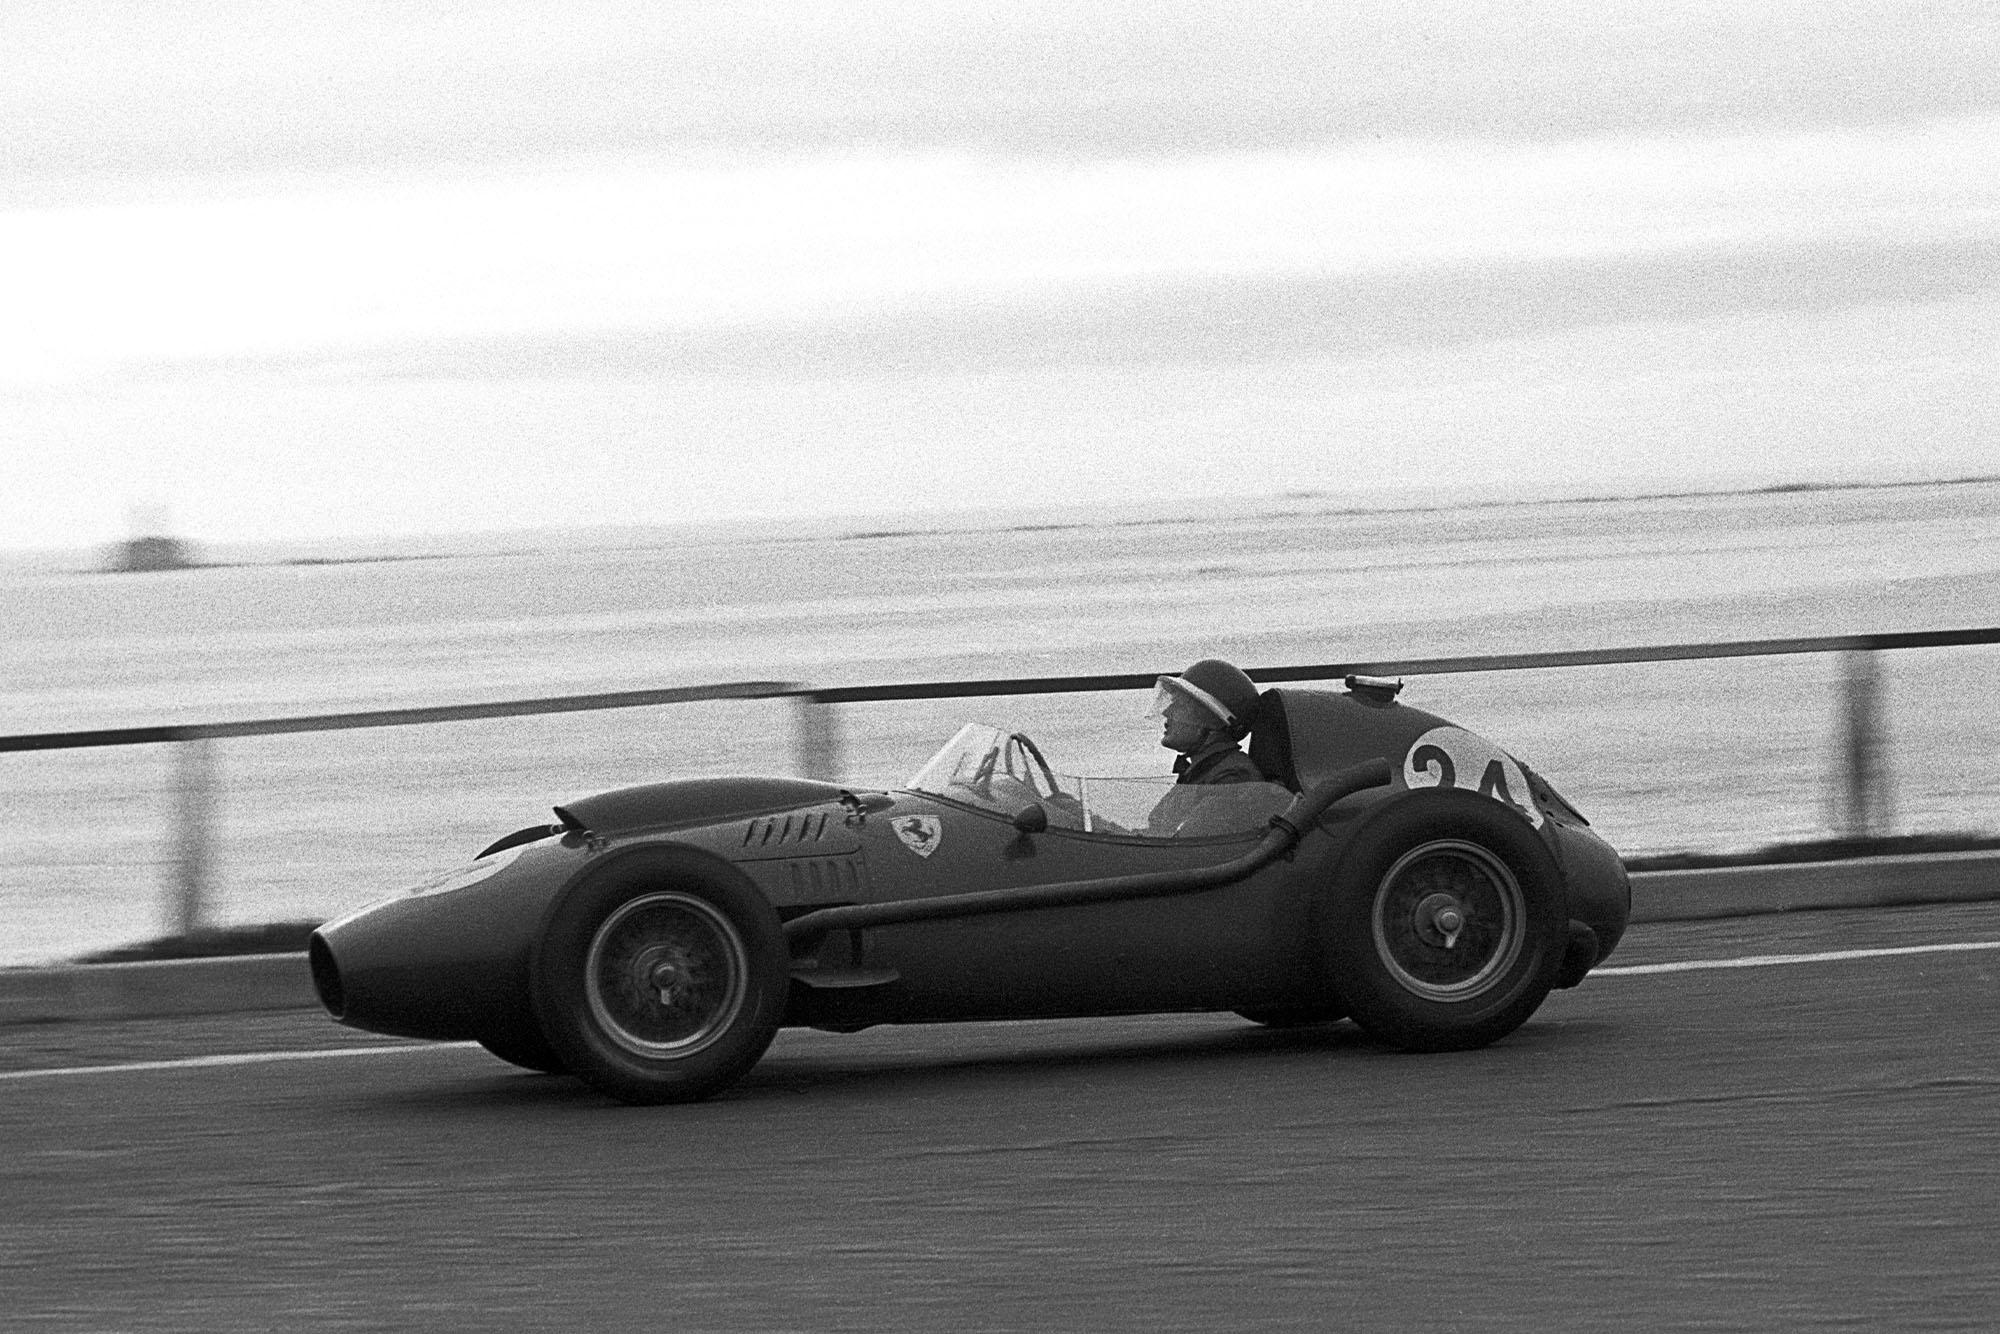 Mike Hawthorn, Ferrari Dino 246, Grand Prix of Portugal, Boavista, 24 August 1958. (Photo by Bernard Cahier/Getty Images)